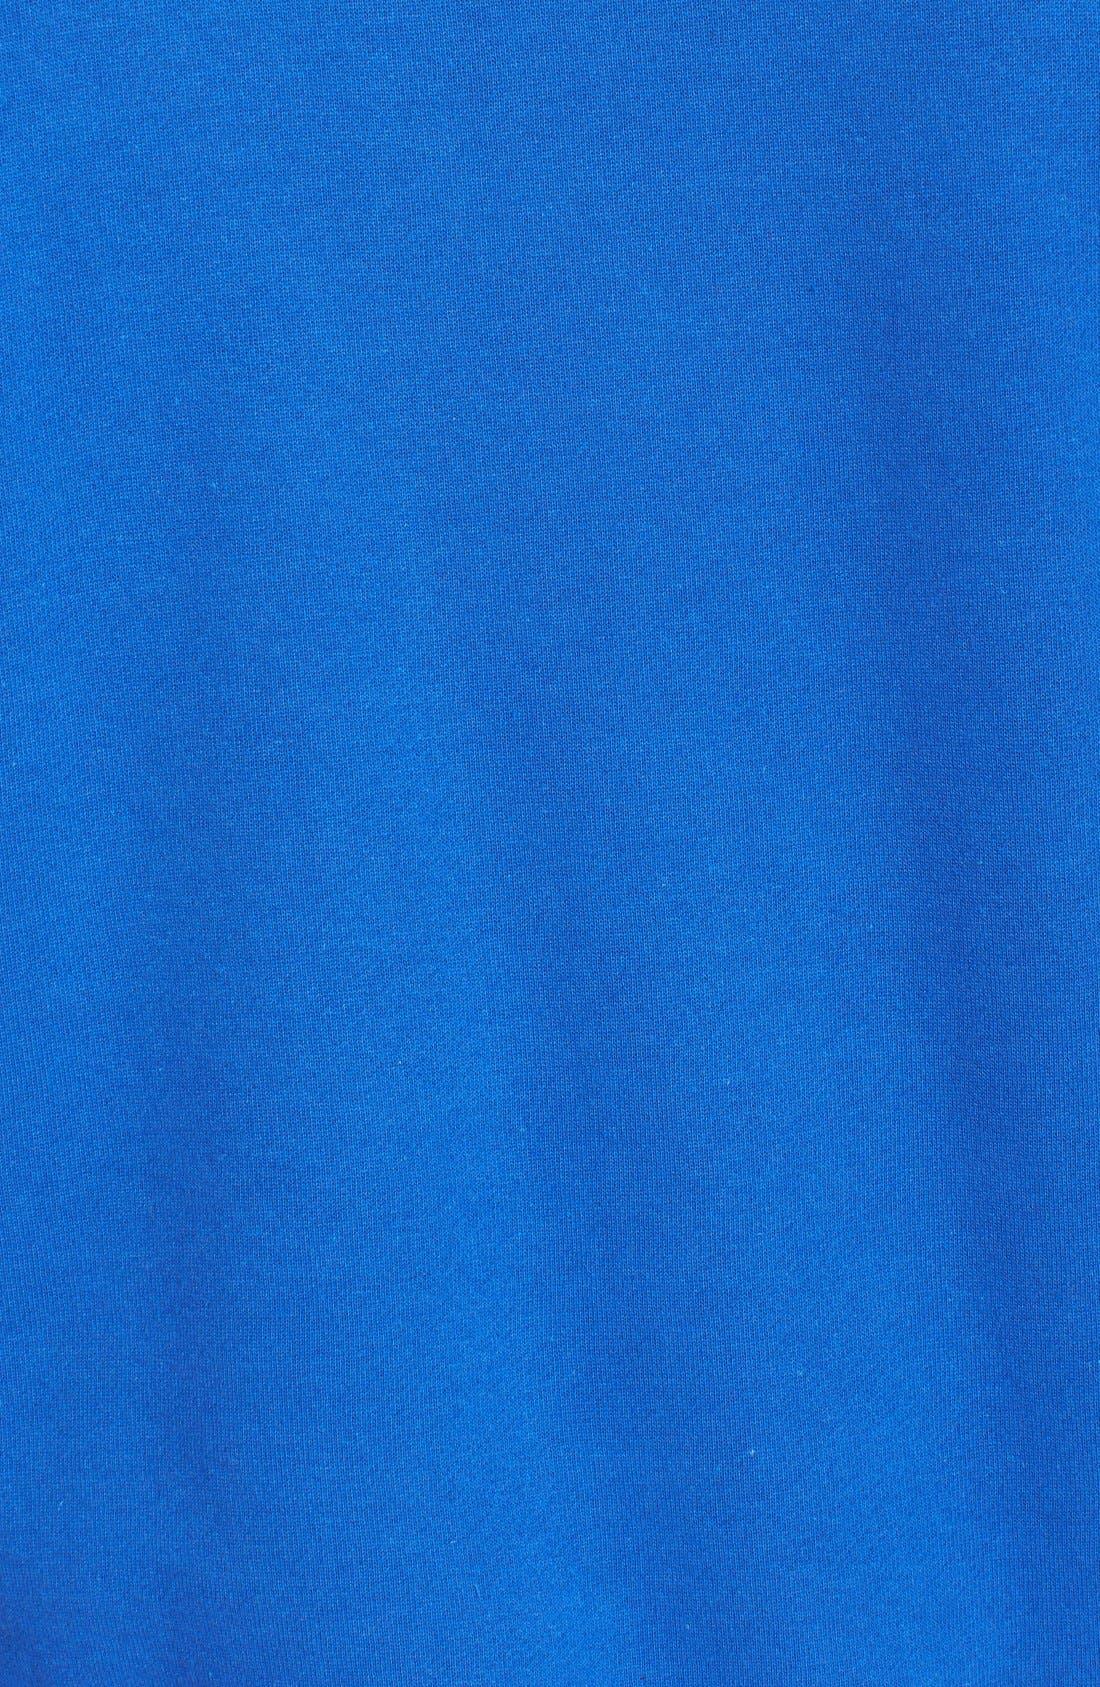 Alternate Image 3  - Mitchell & Ness 'Chicago Cubs' Crewneck Sweatshirt